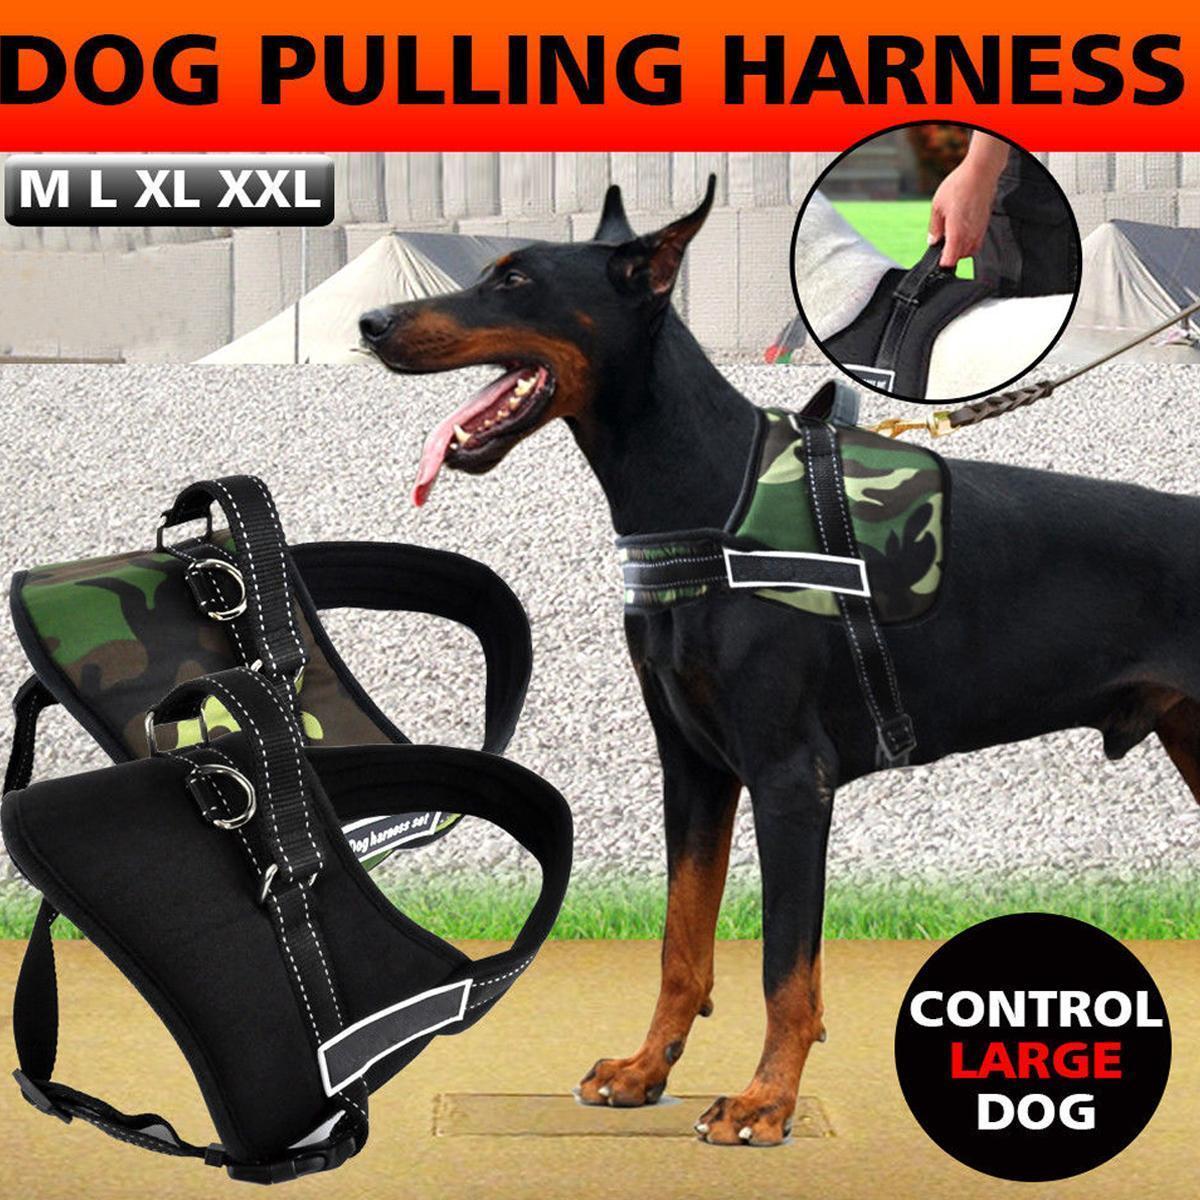 Control Dog Pulling Harness Adjustable Support Comfy Pet Pitbull Training Black L